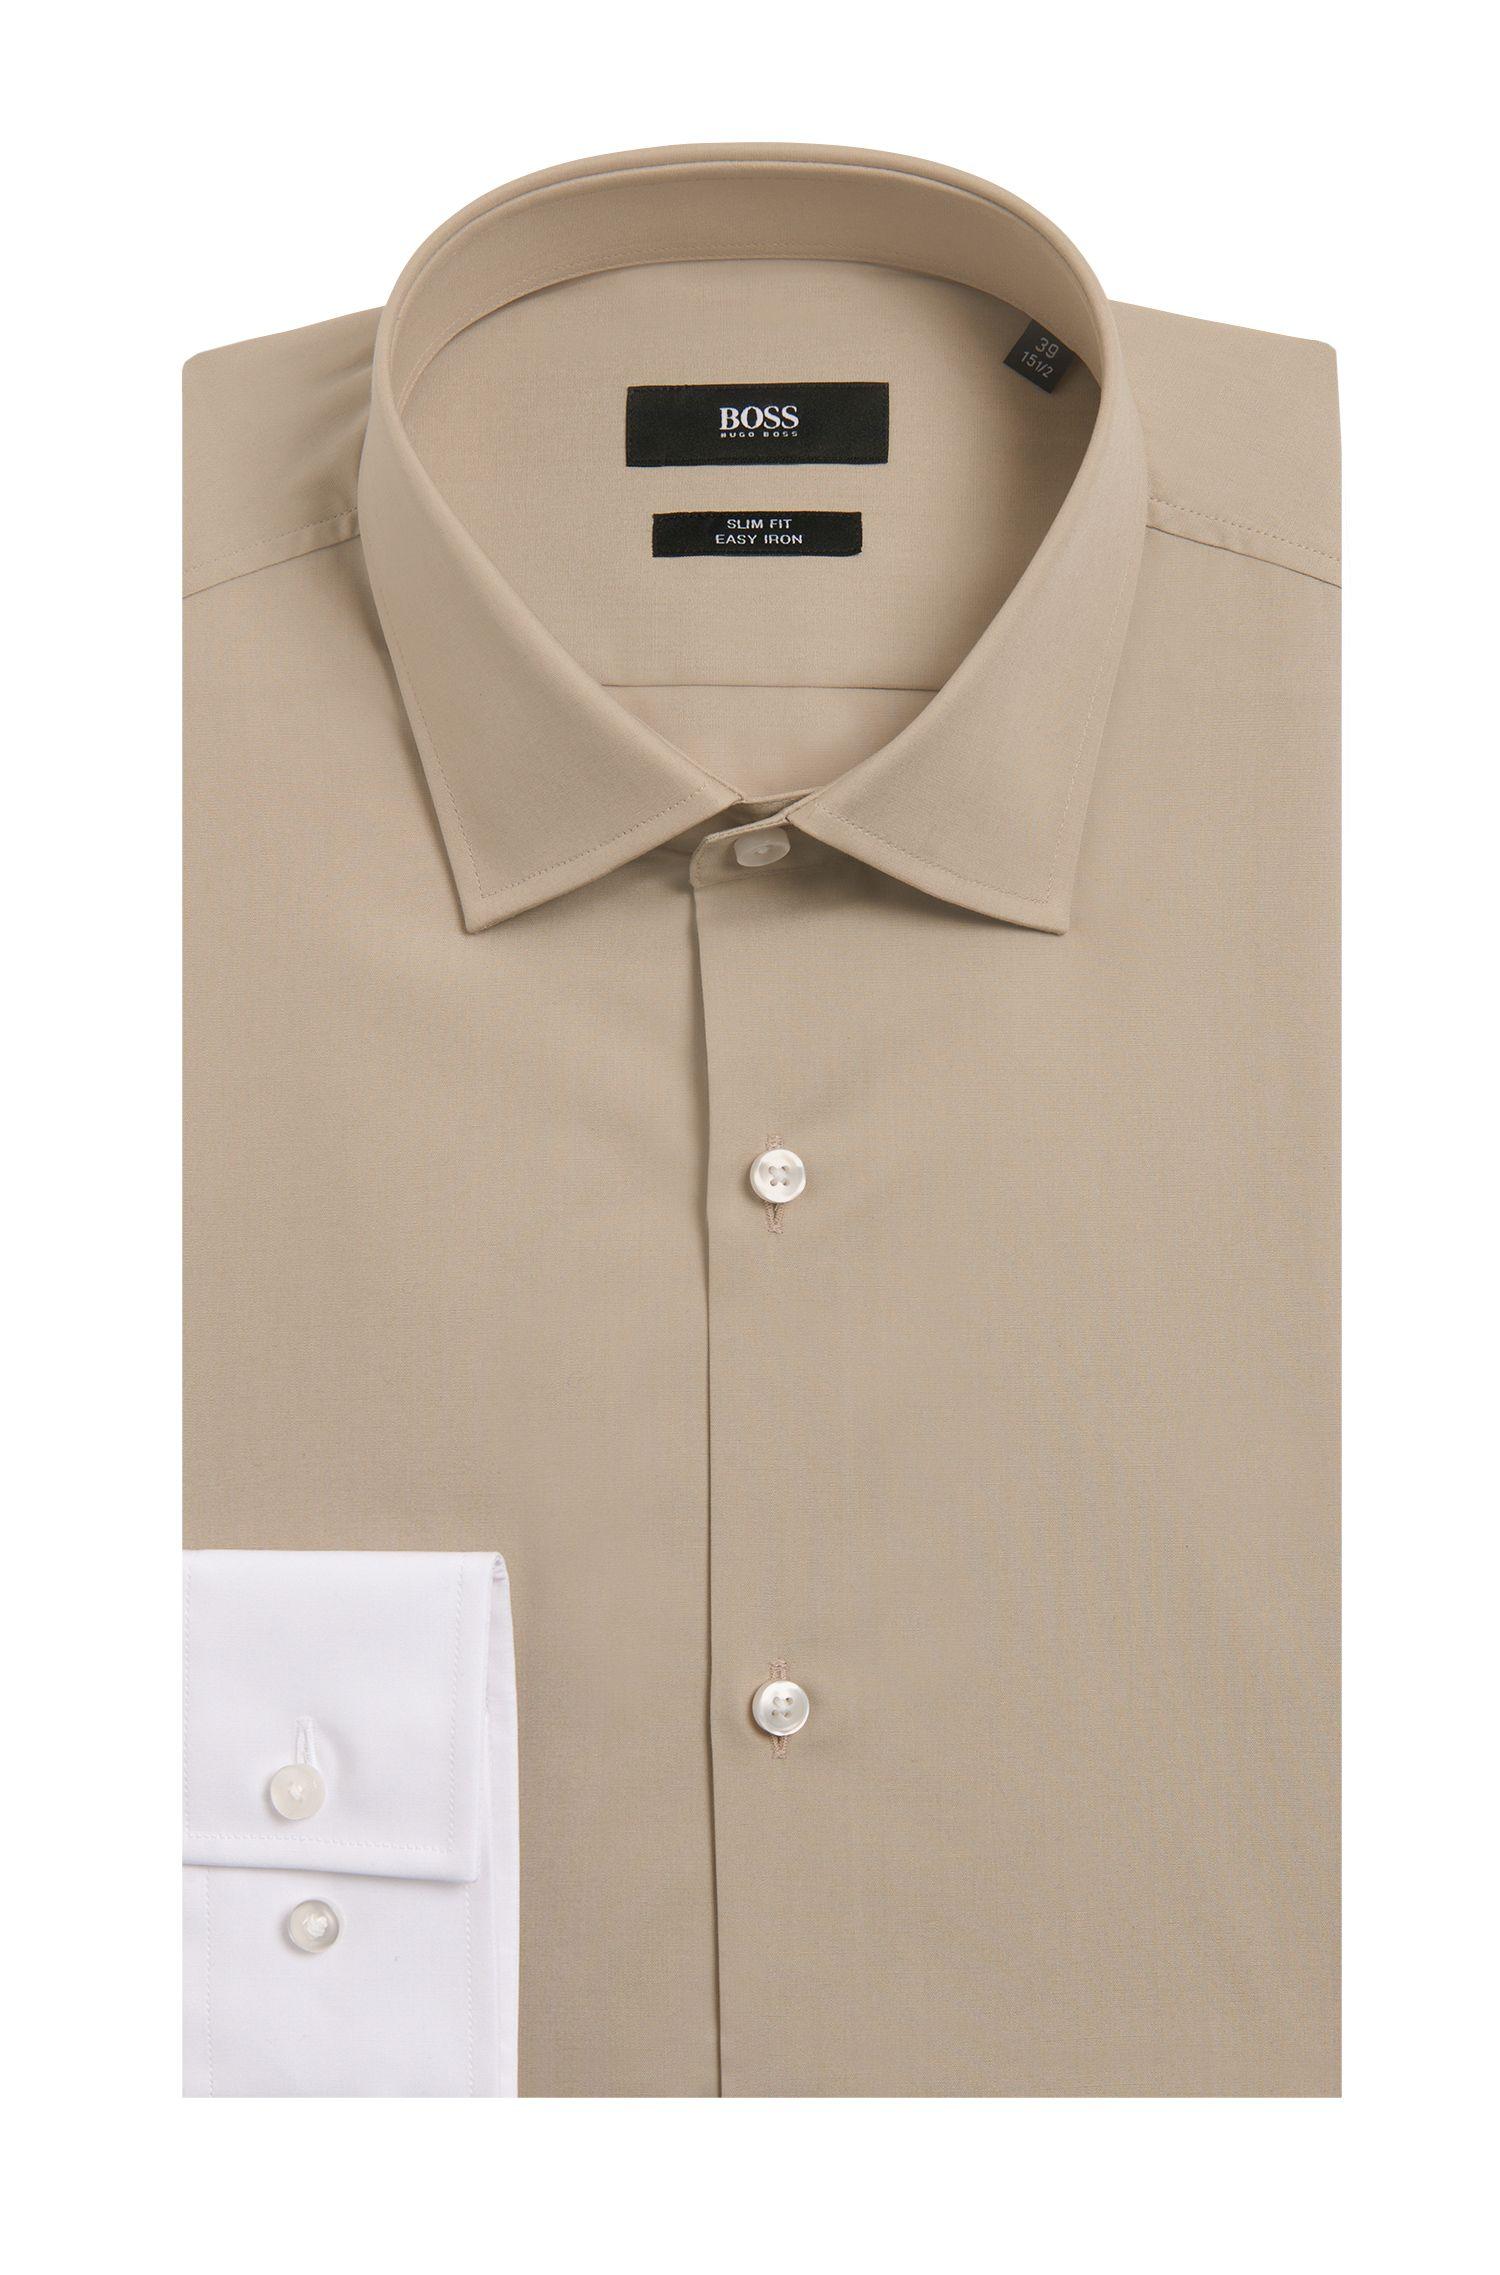 'Jeven' | Slim-Fit, Cotton Two-Tone Dress Shirt